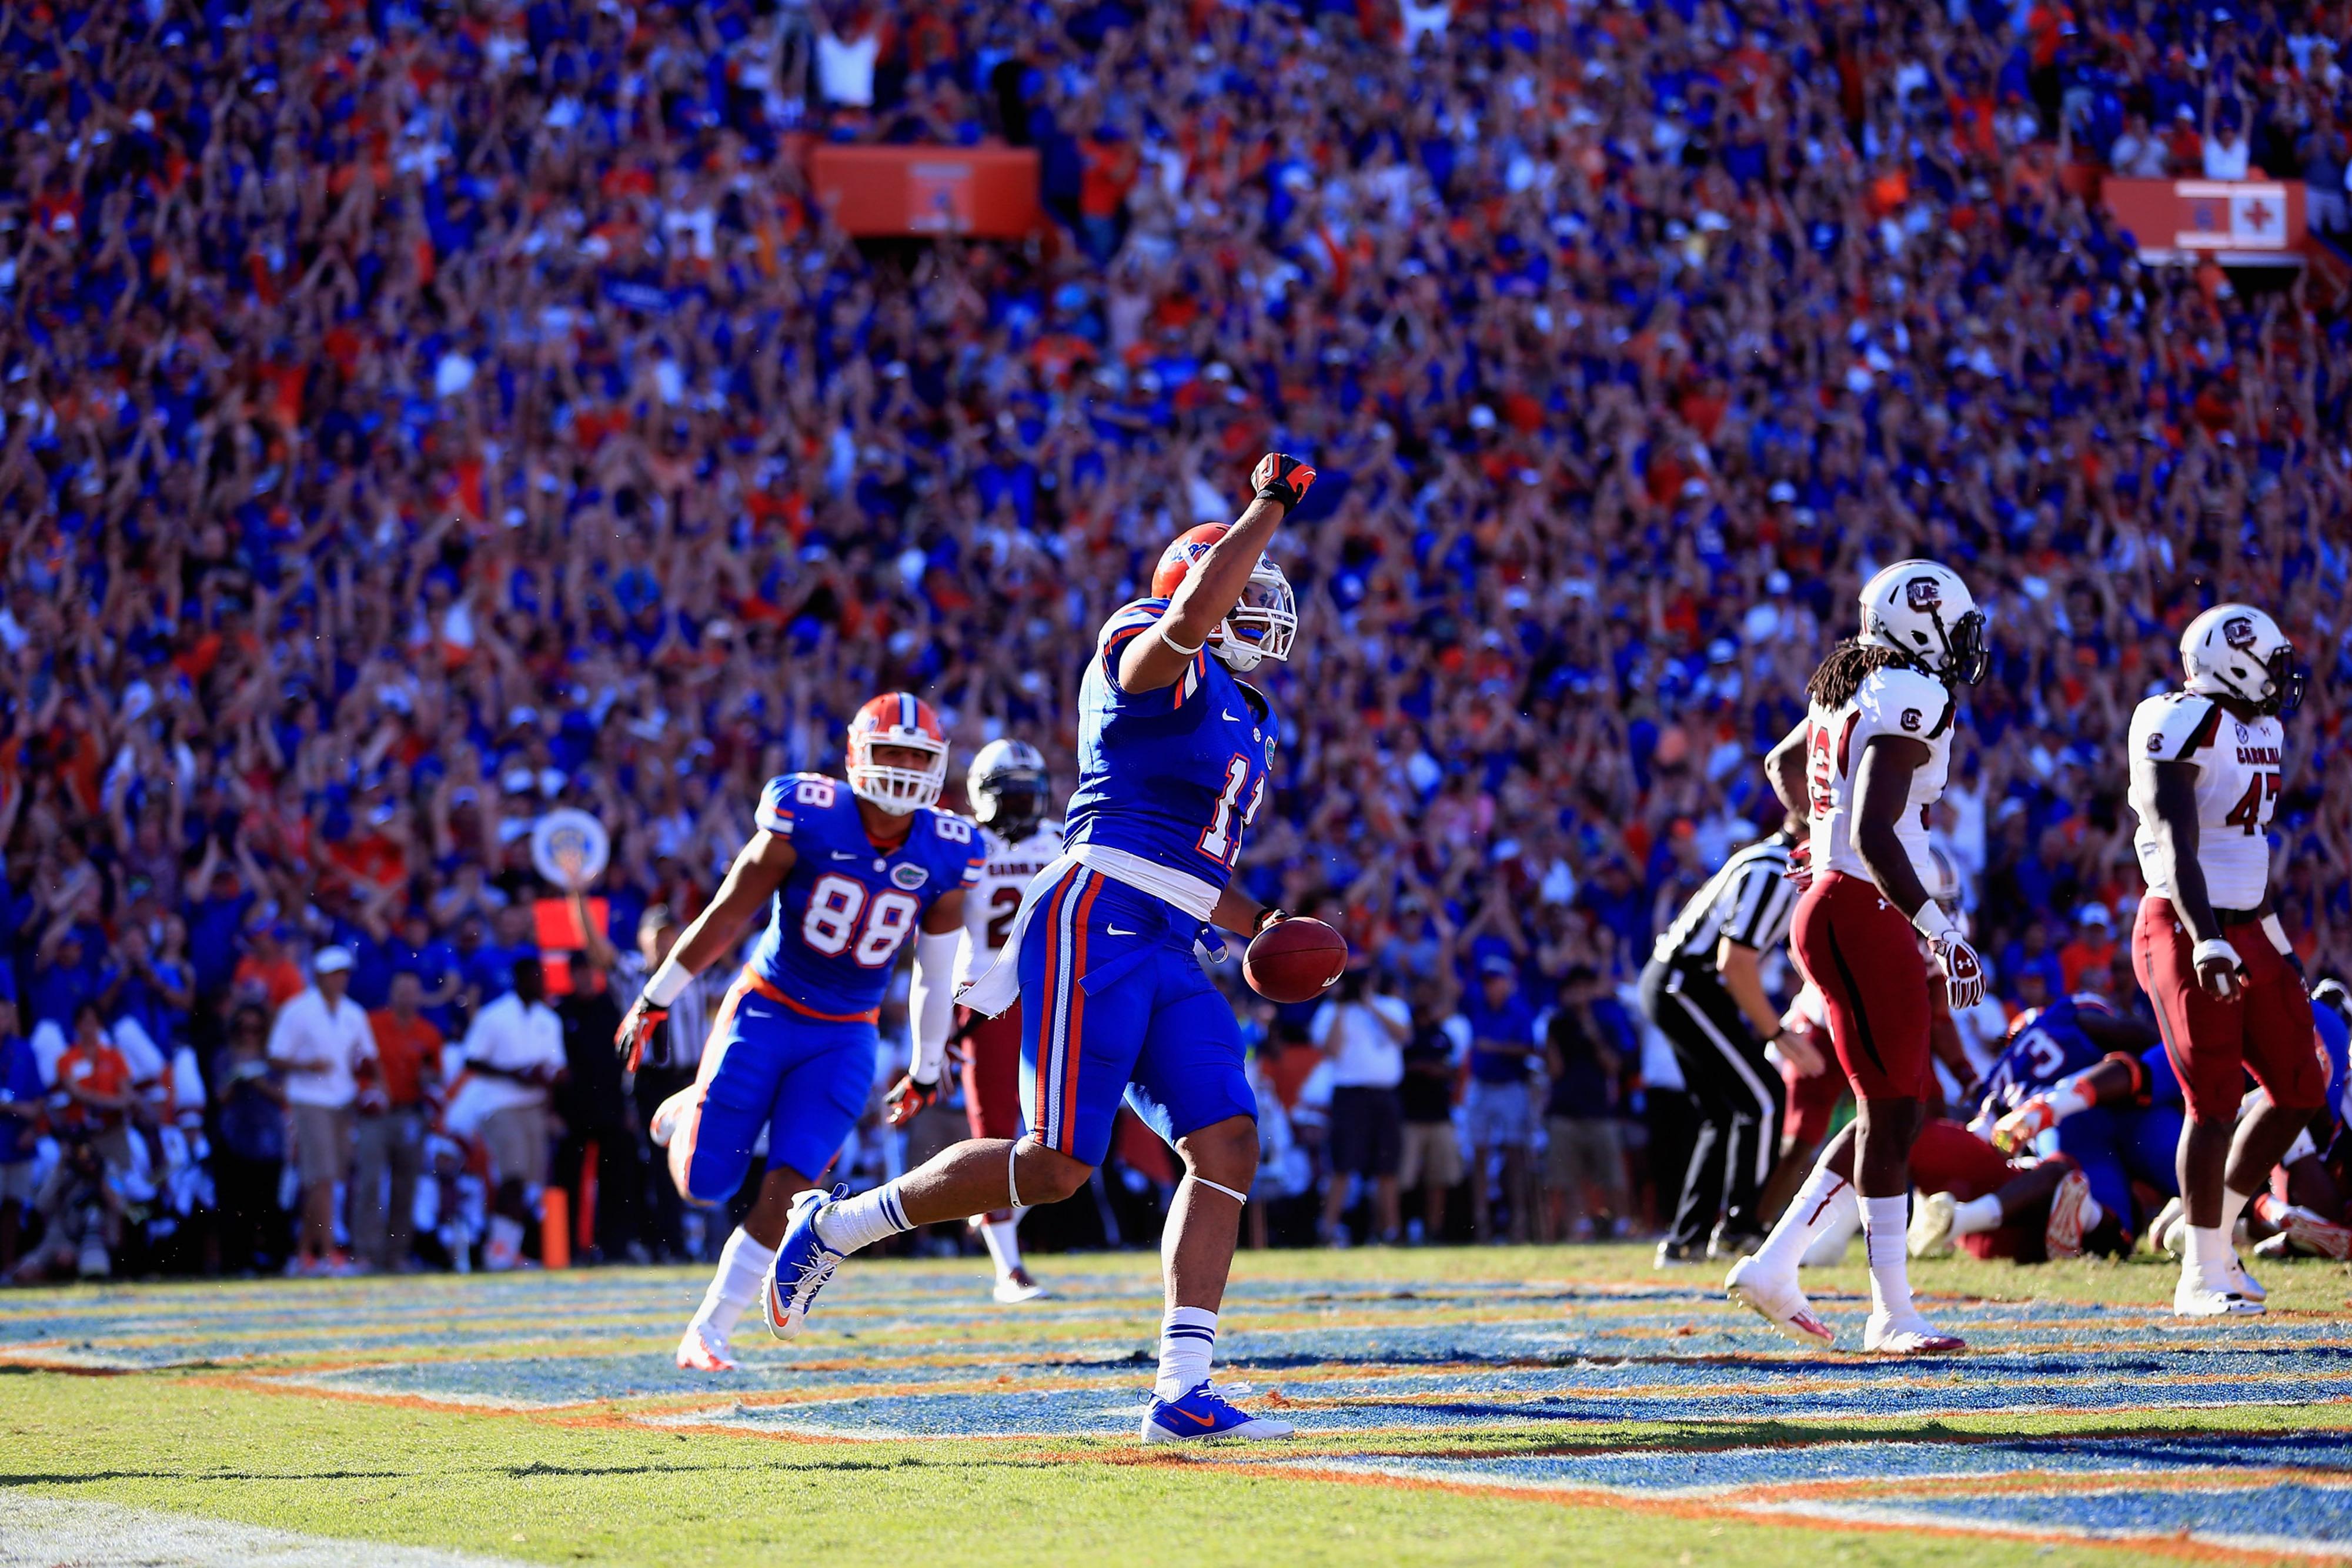 NFL Draft 2013: Breaking down the 'Joker' tight ends